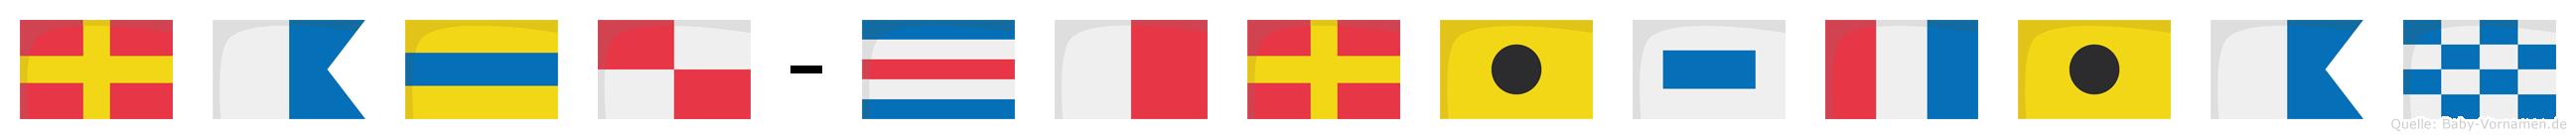 Radu-Christian im Flaggenalphabet